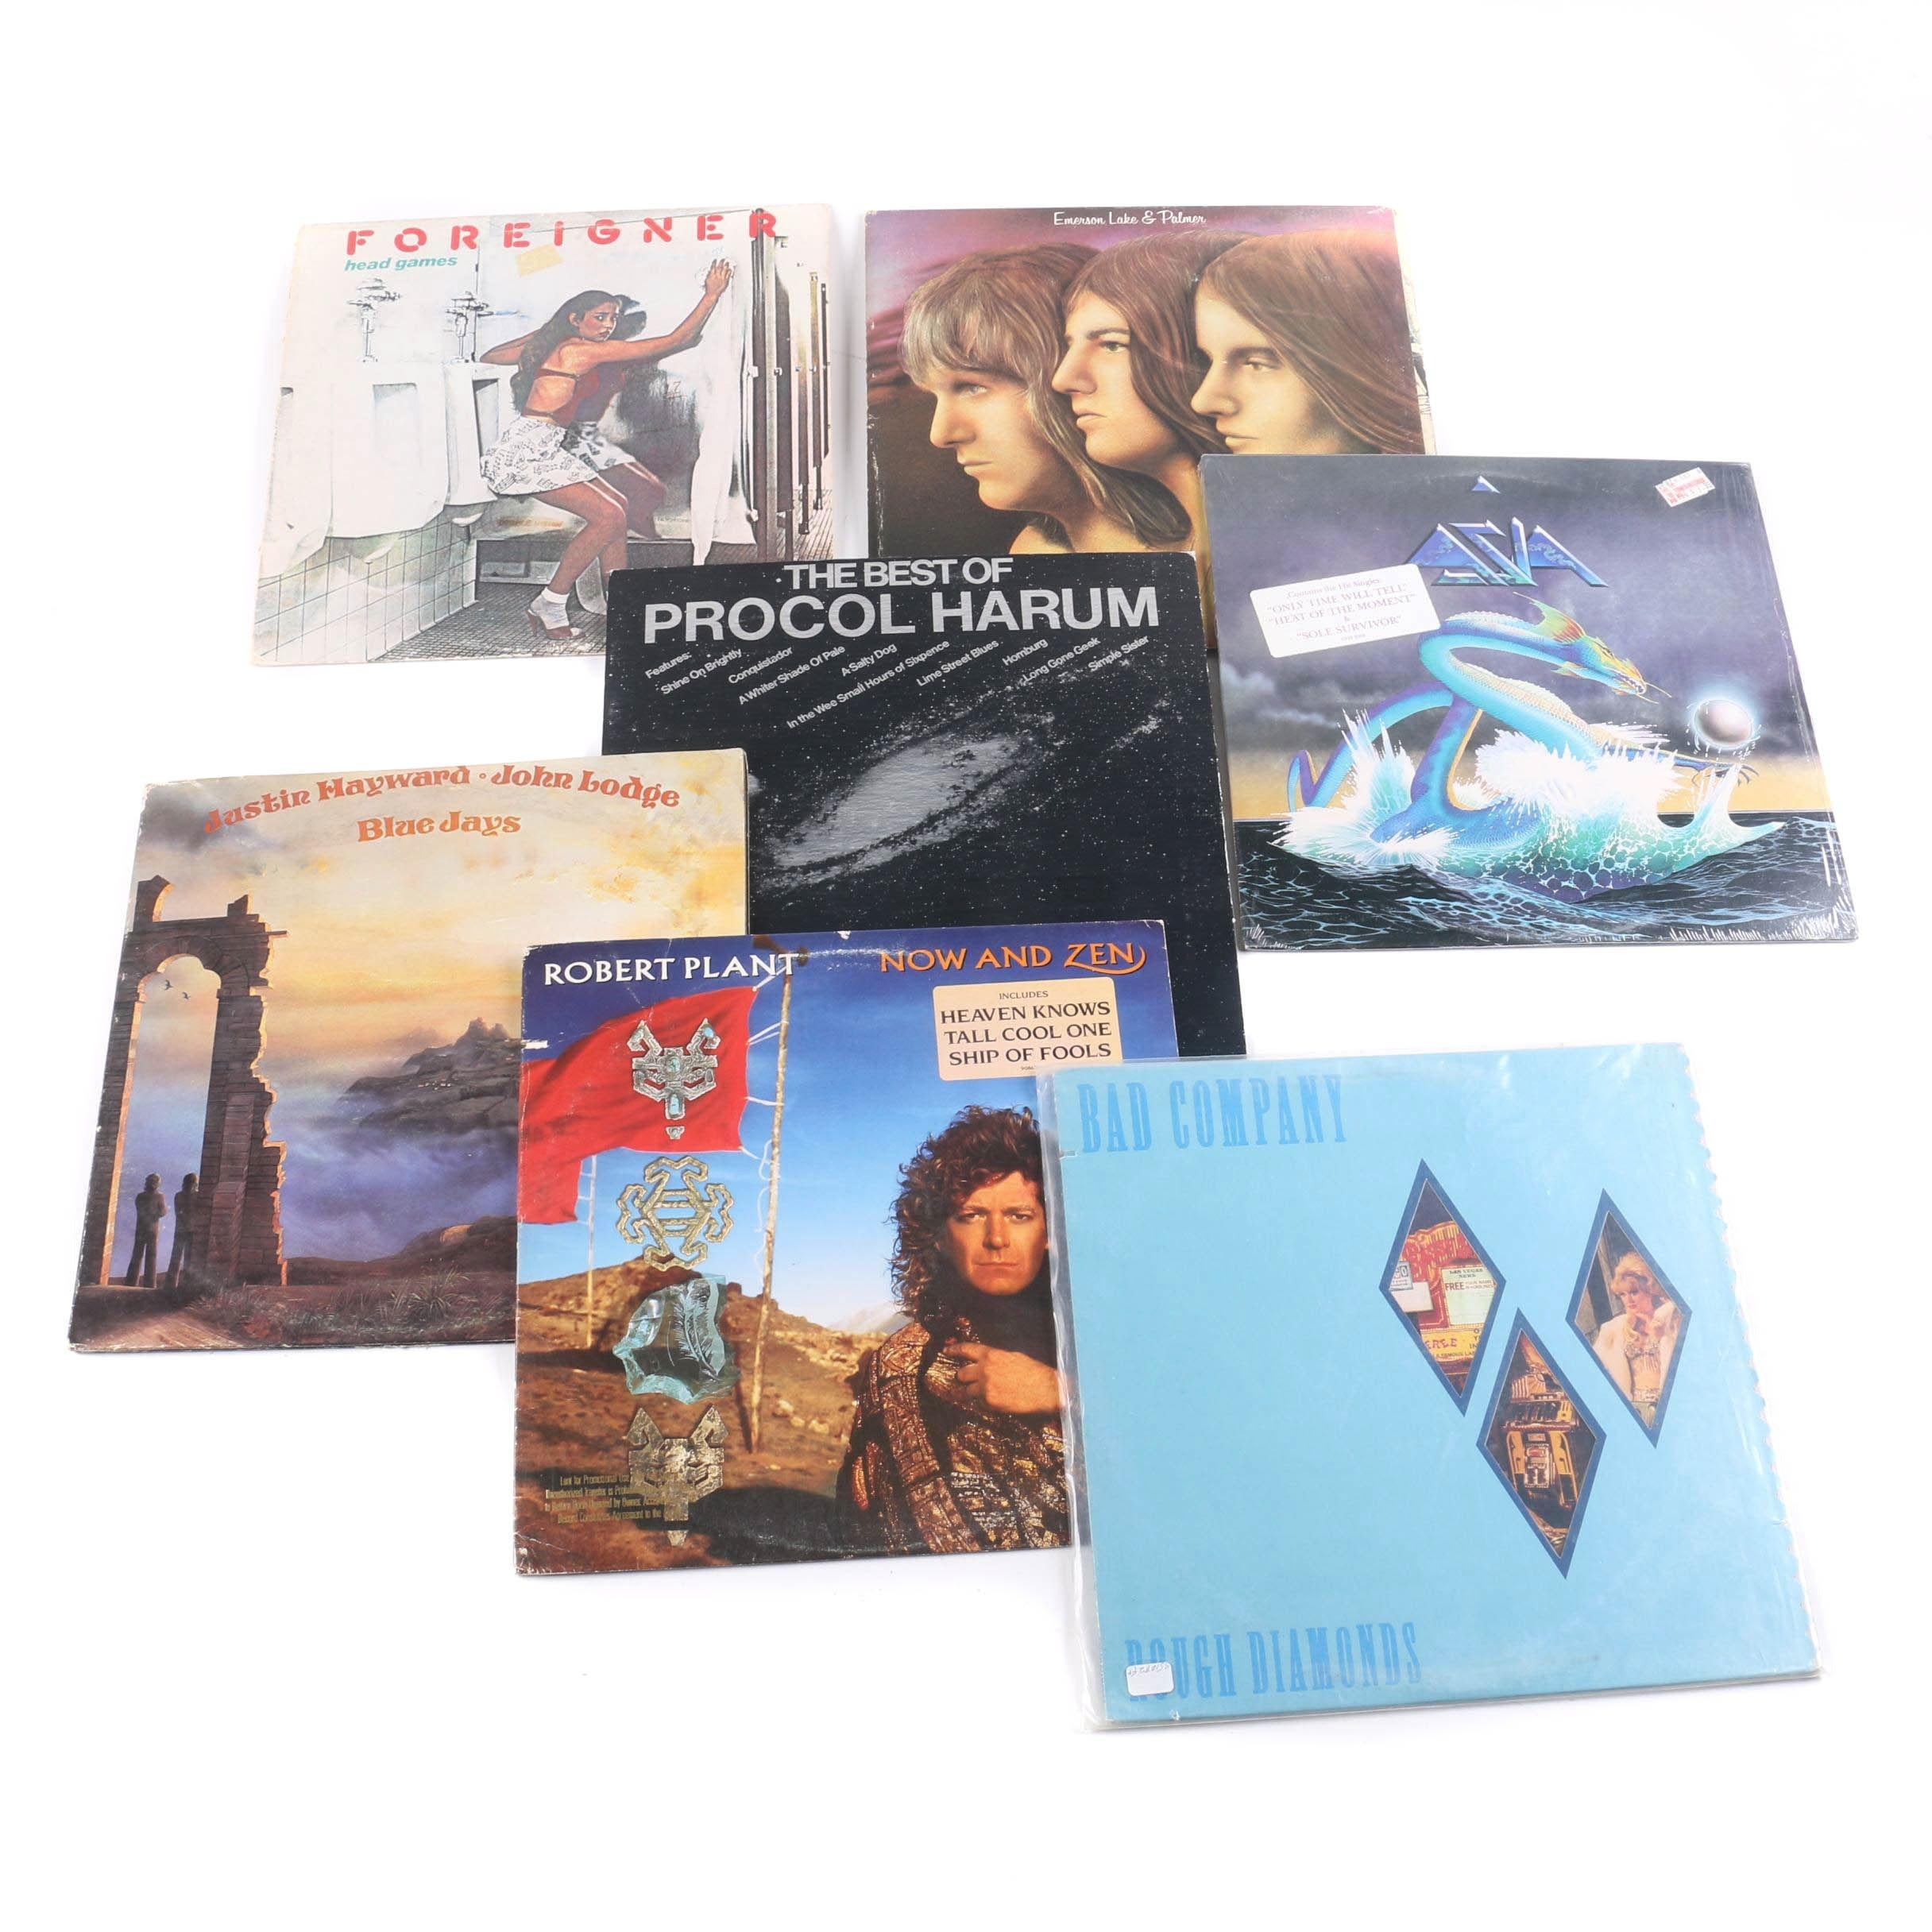 Classic Rock LPs